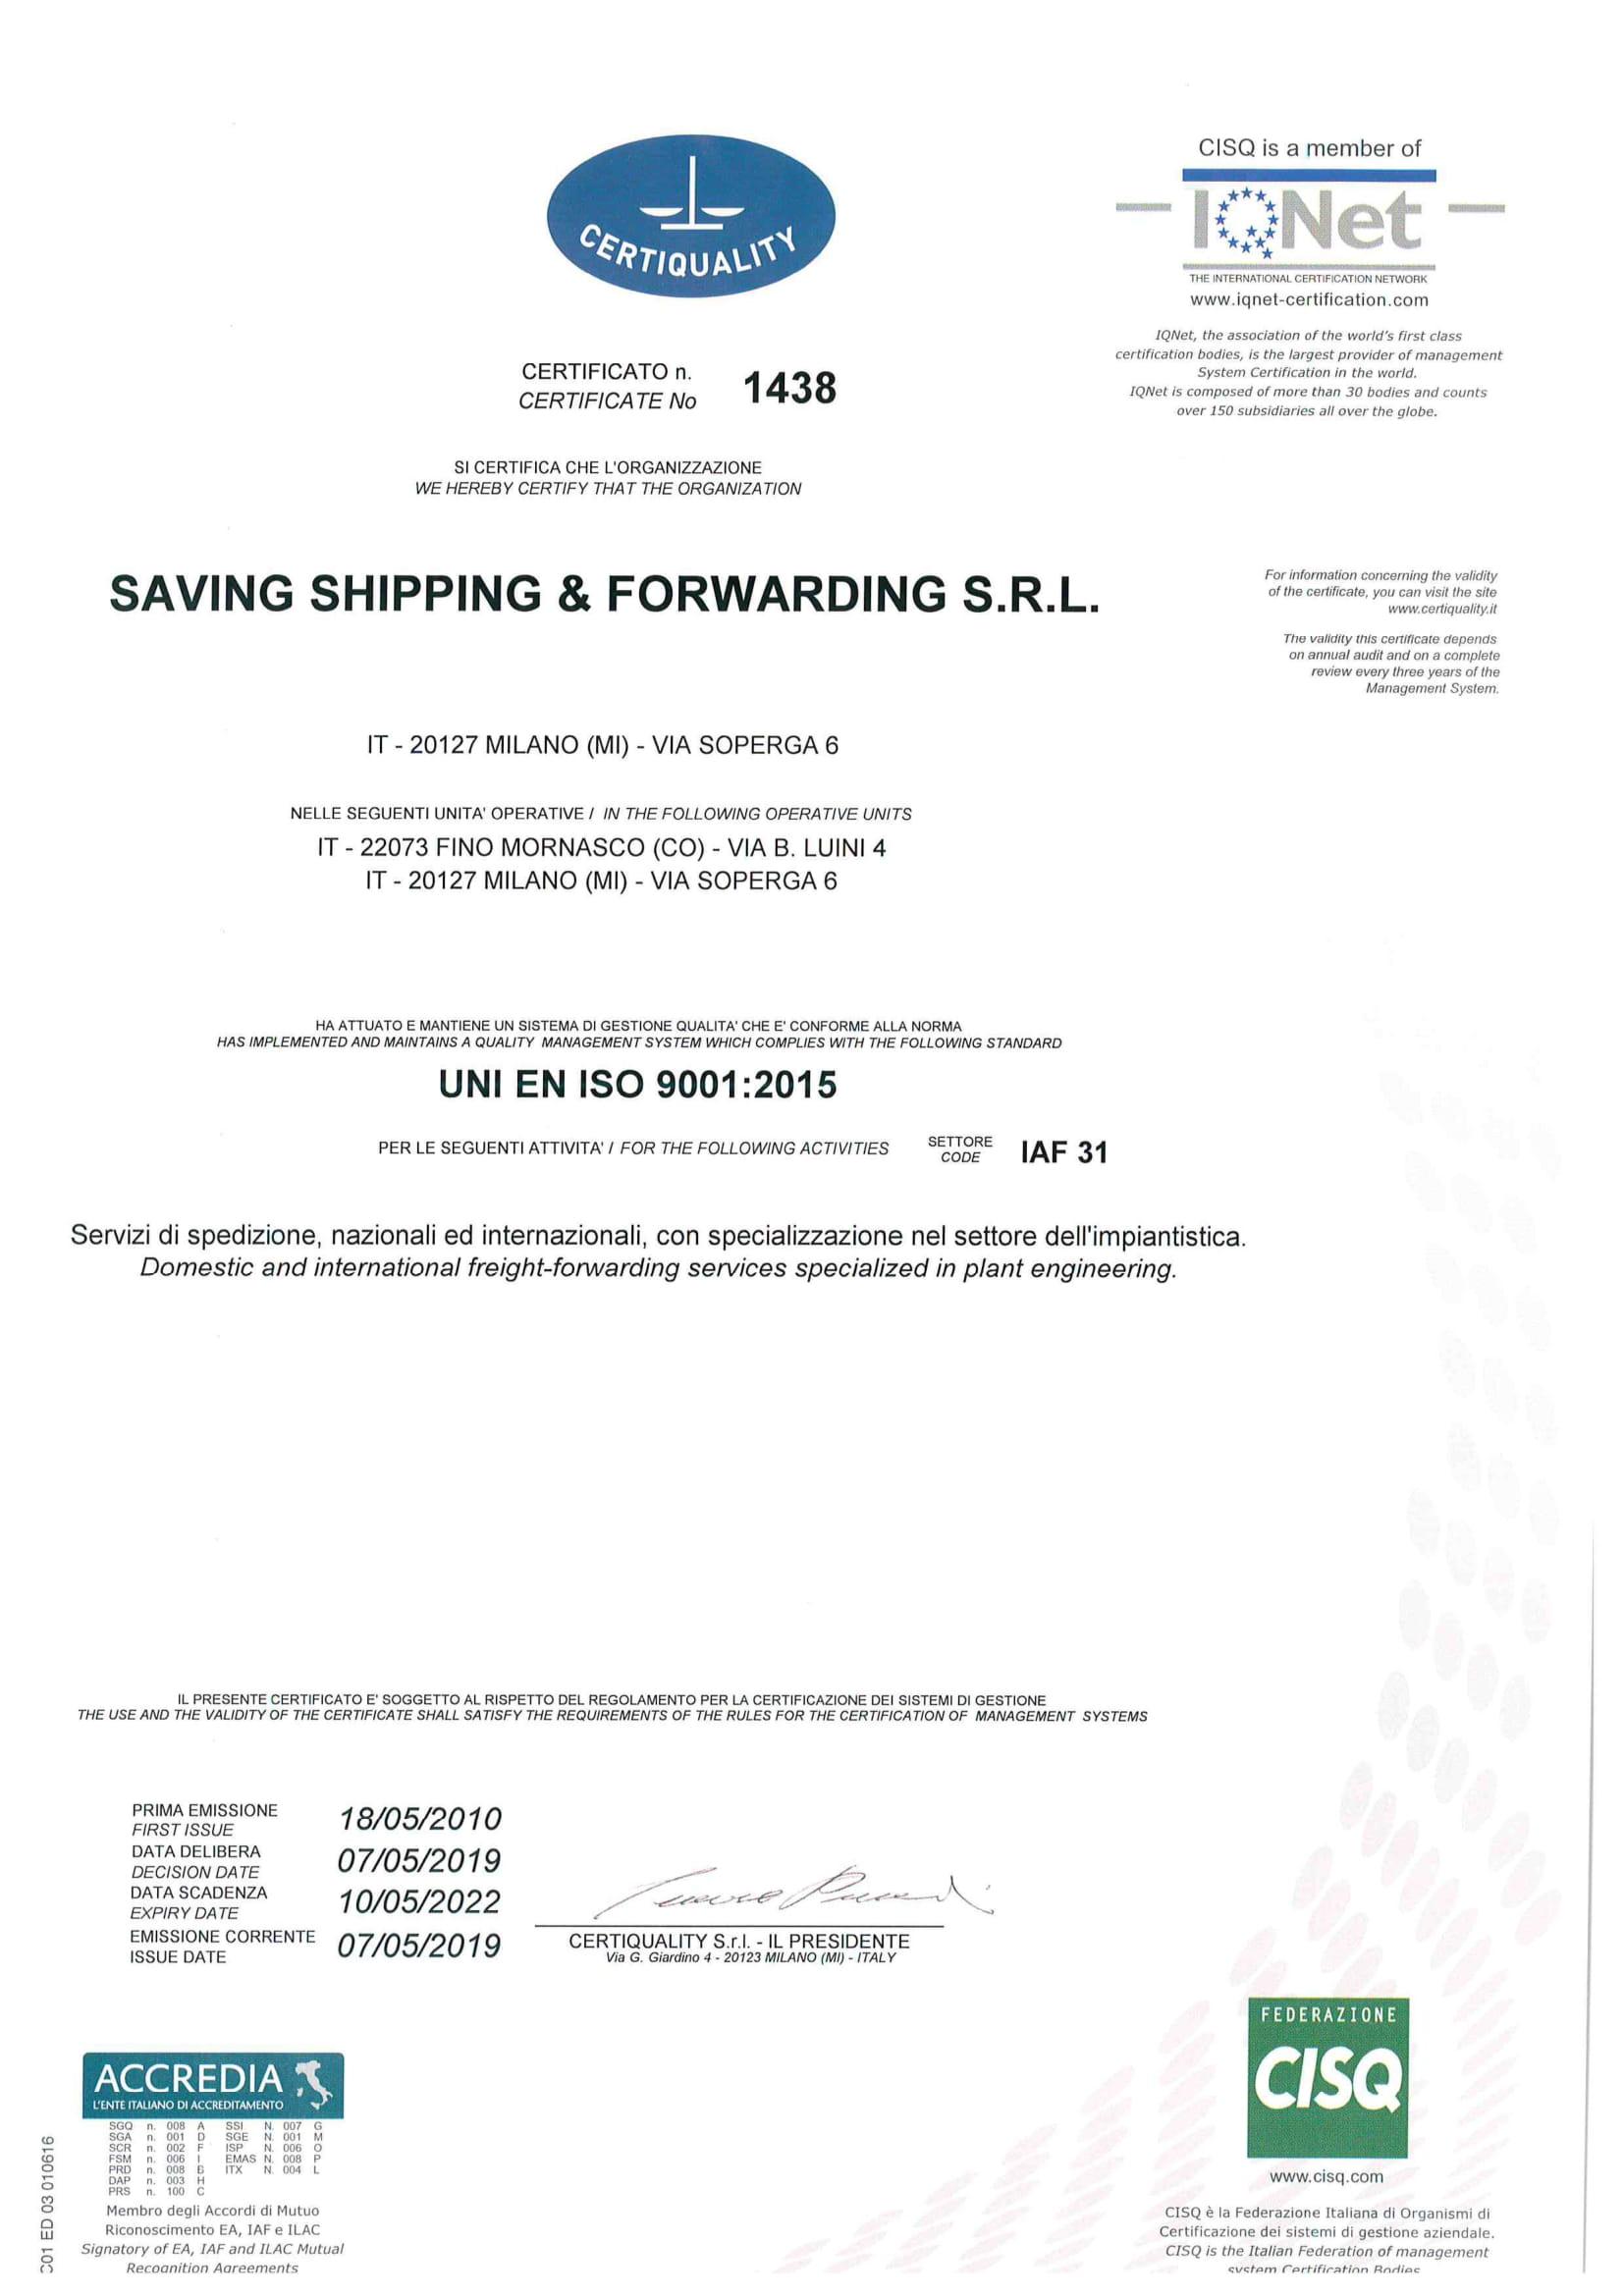 http://www.savingroup.com/images/uploads/qualita/CERTIQUALITY-SSF-2019.jpg